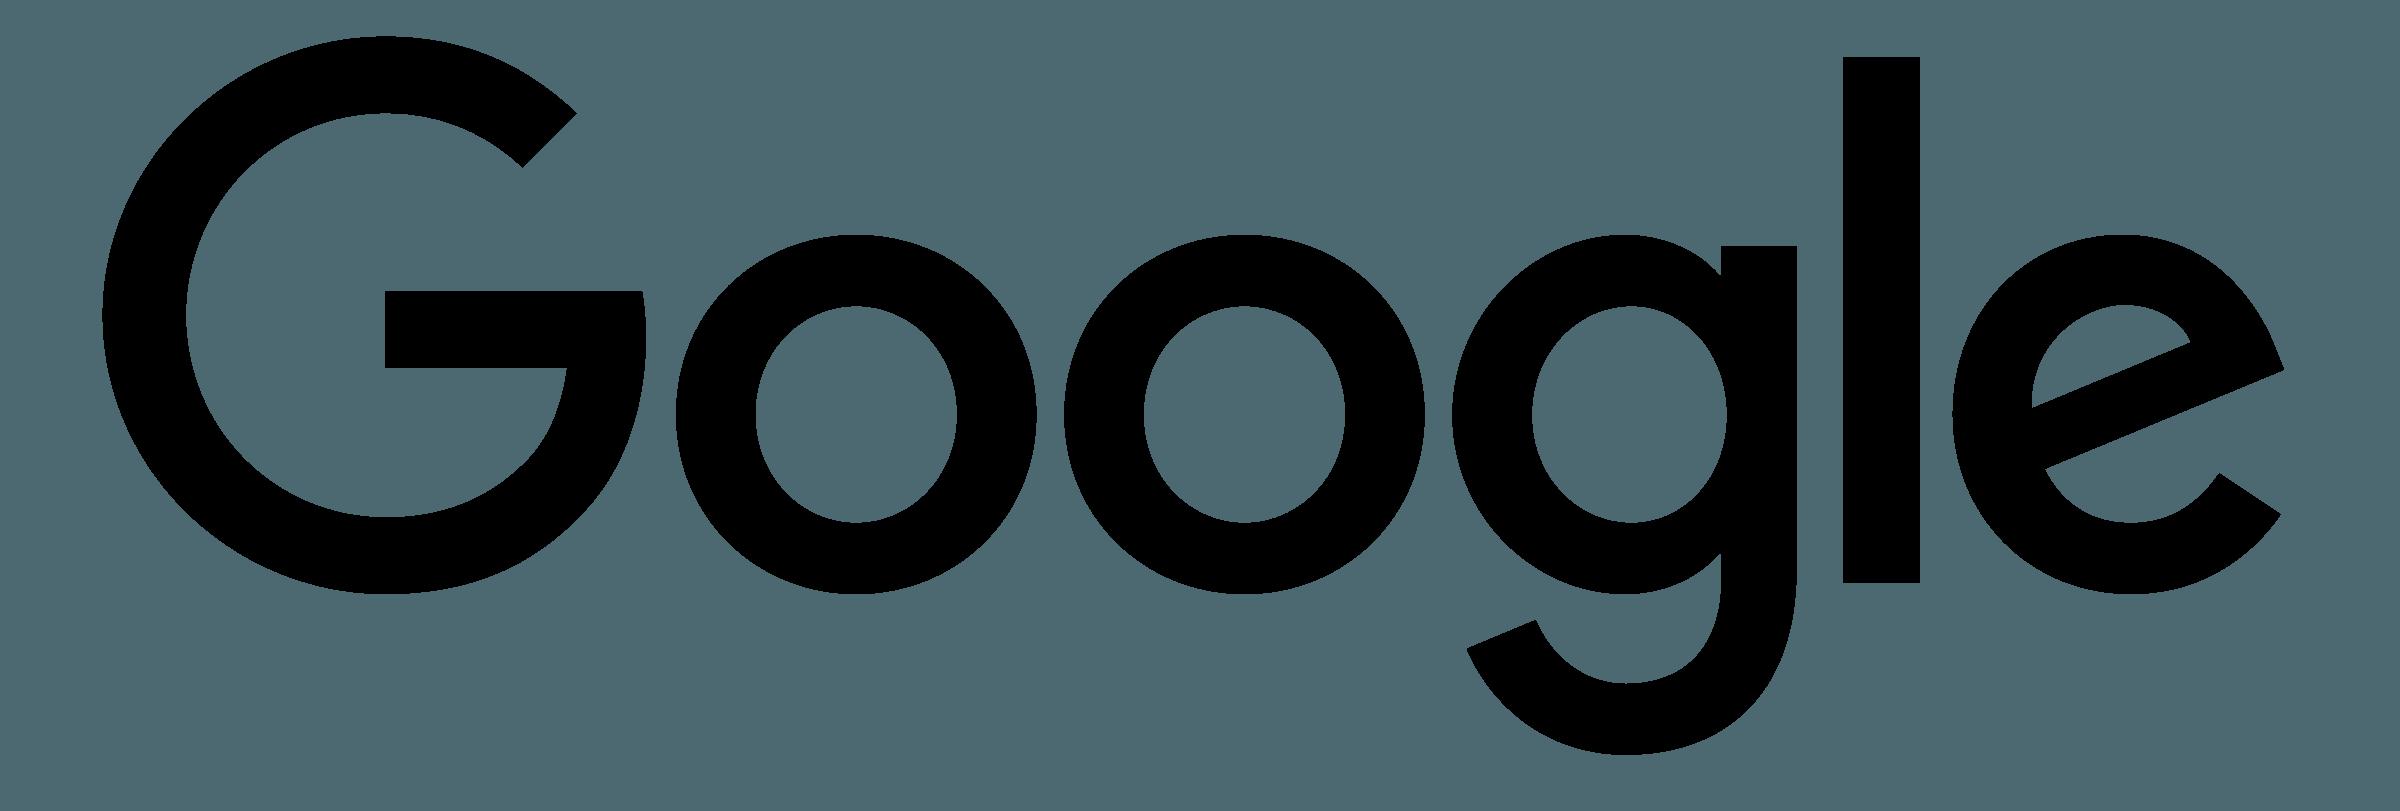 ILA Program - Google